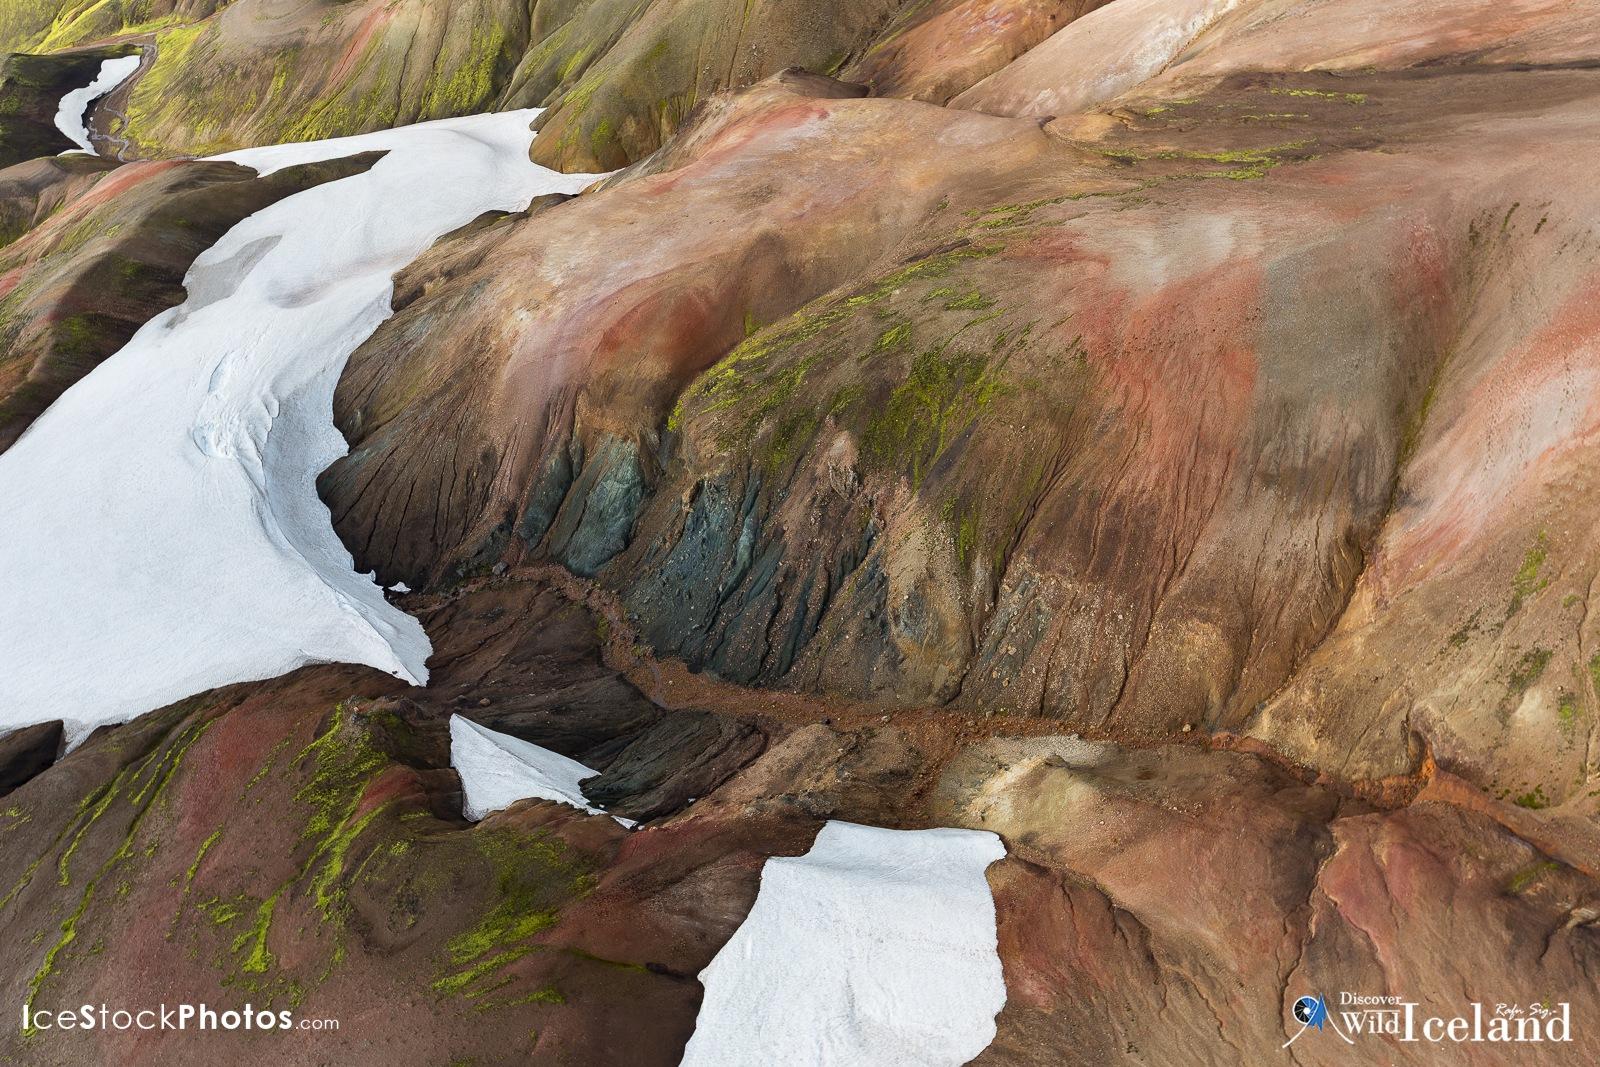 Discover Wild Iceland – Hrafntinnusker, Geothermal area by Rafn Sig,-  @ Discover Wild Iceland.com